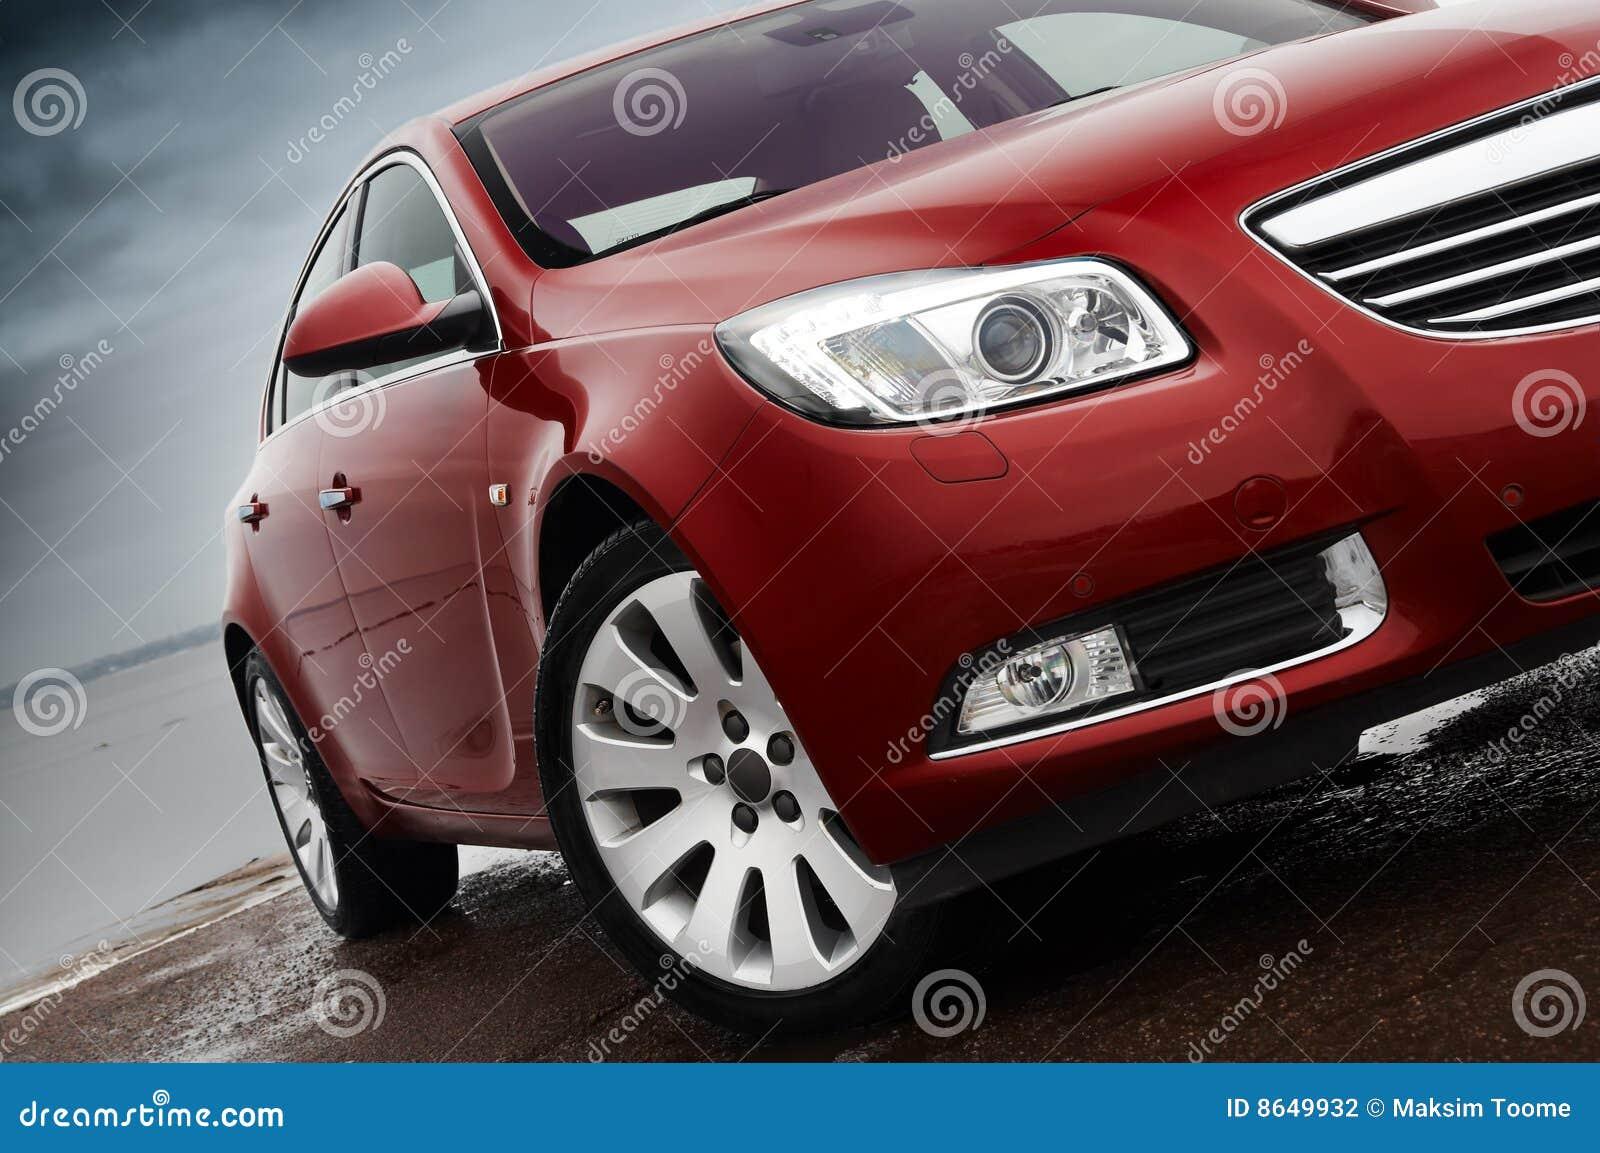 Detalle del frente del coche del rojo de cereza